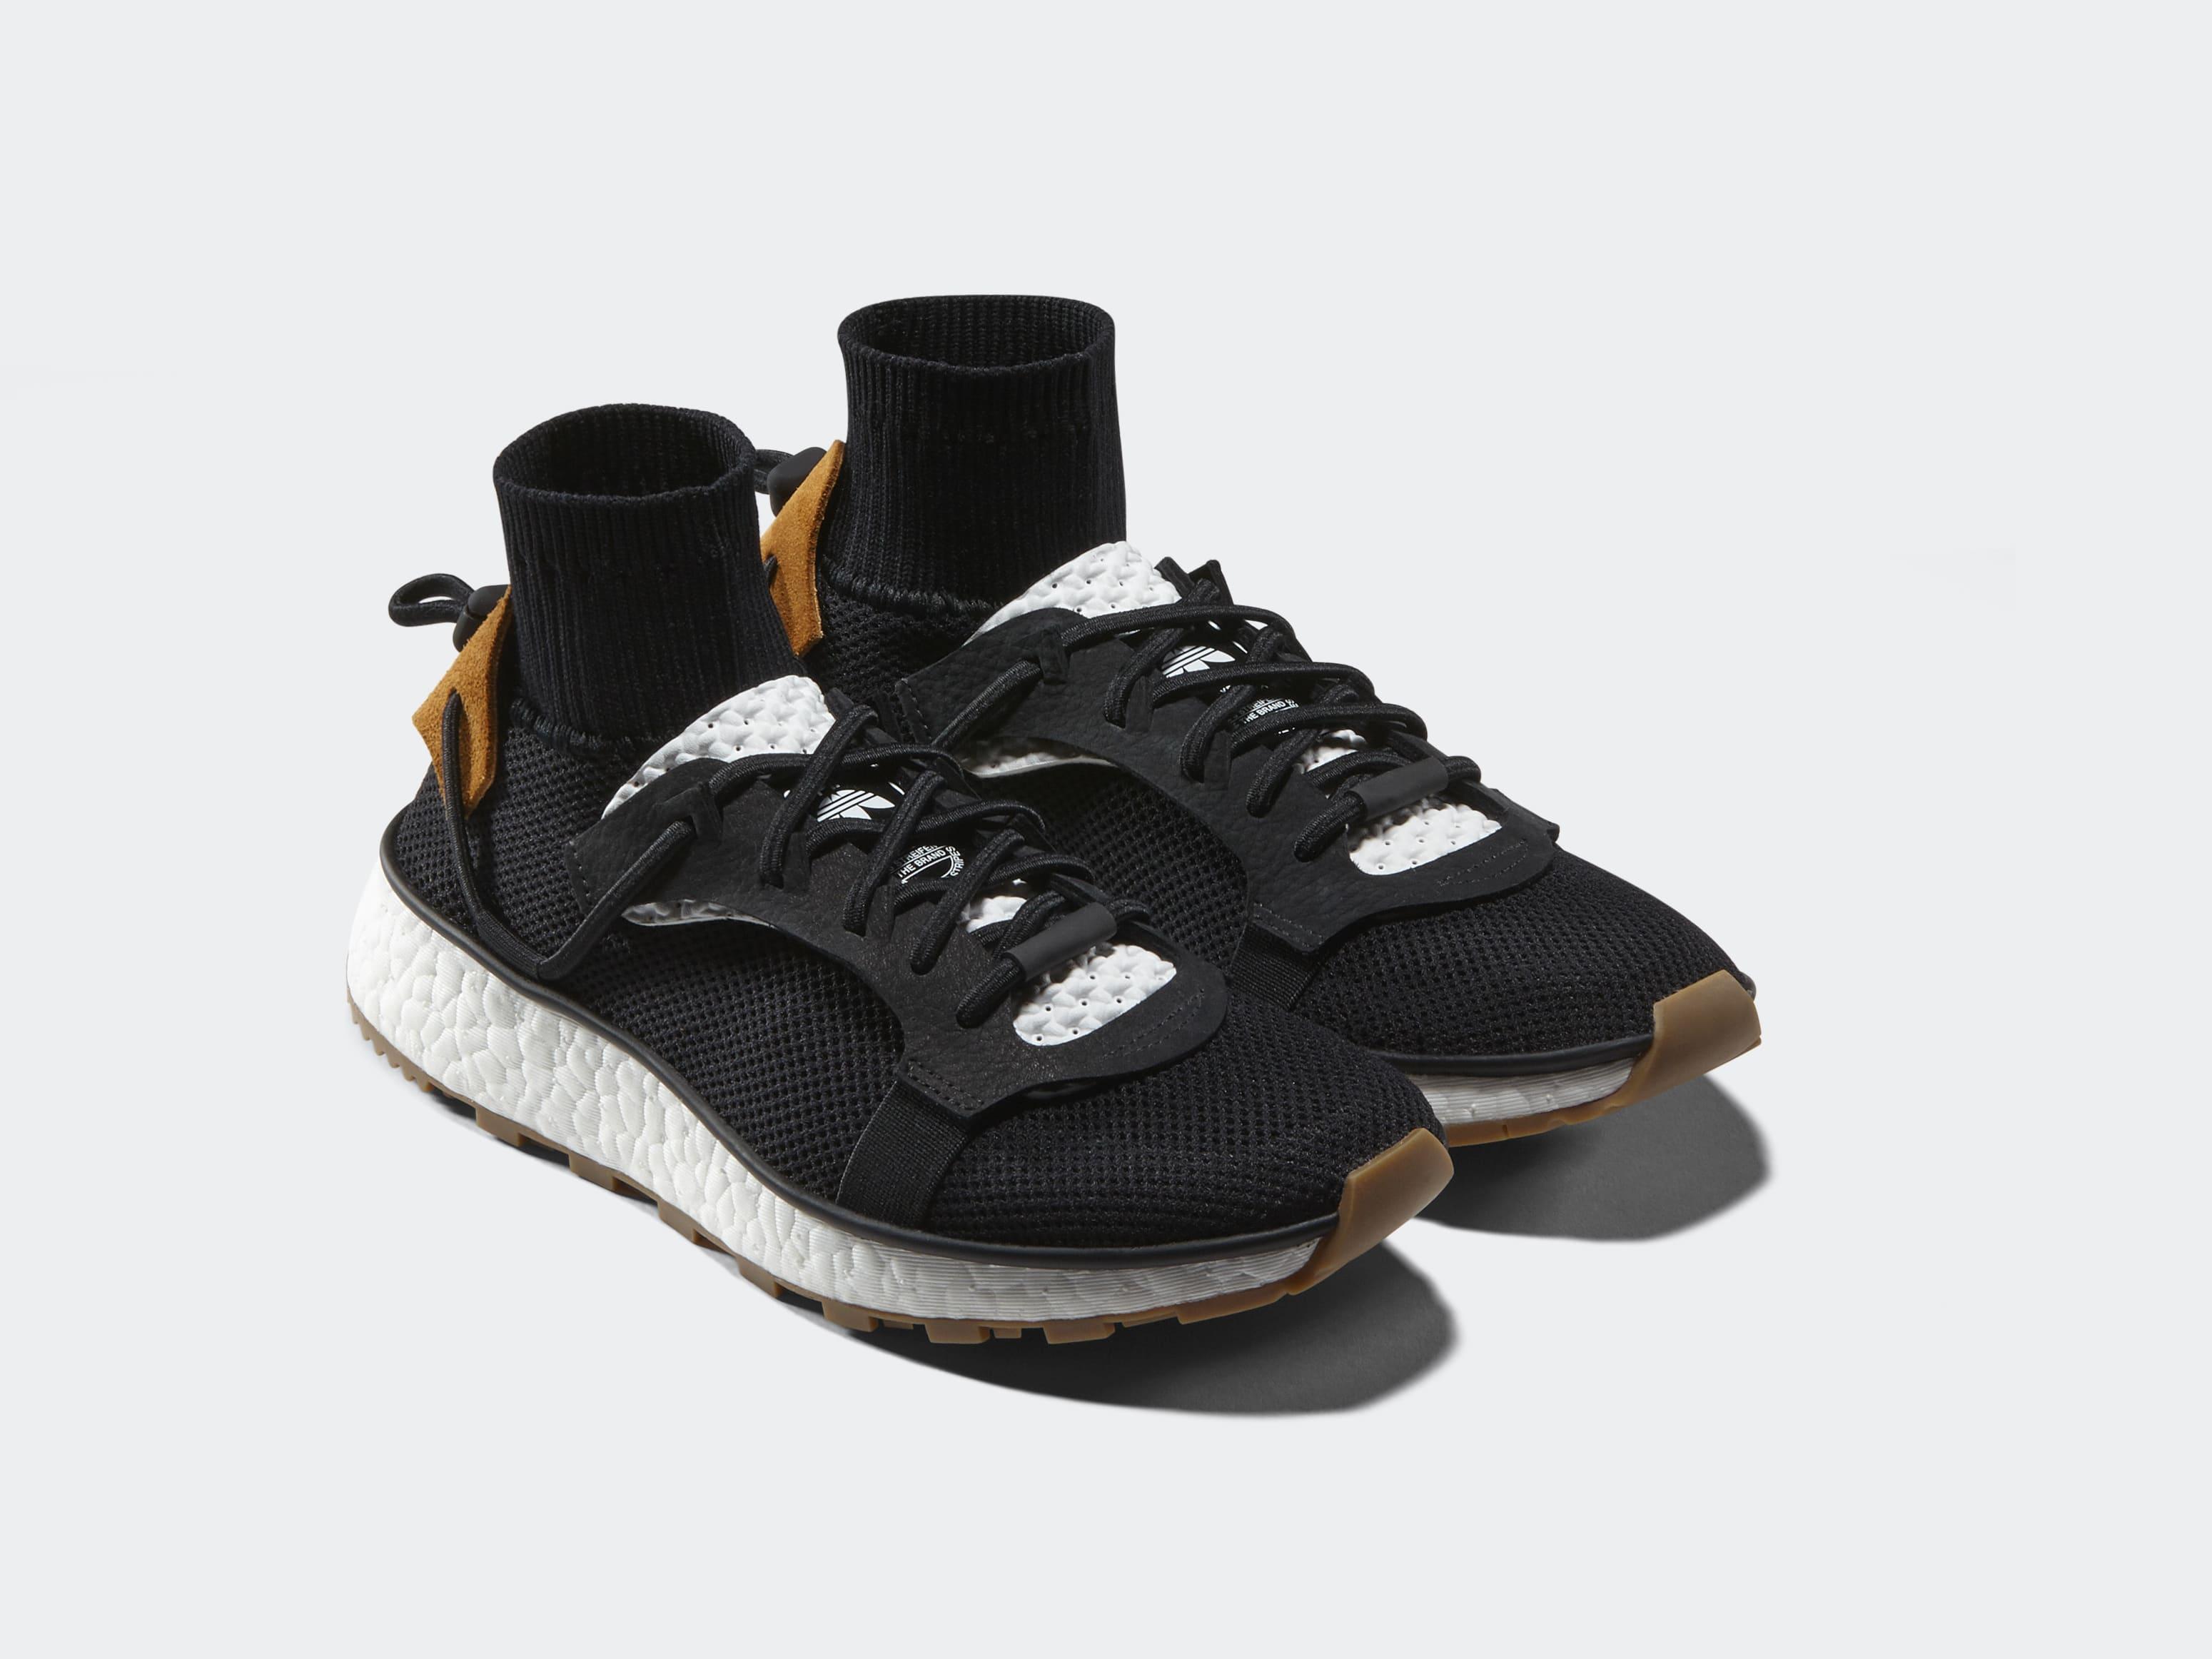 timeless design 38e43 5f61b alexander wang adidas boost white black gum